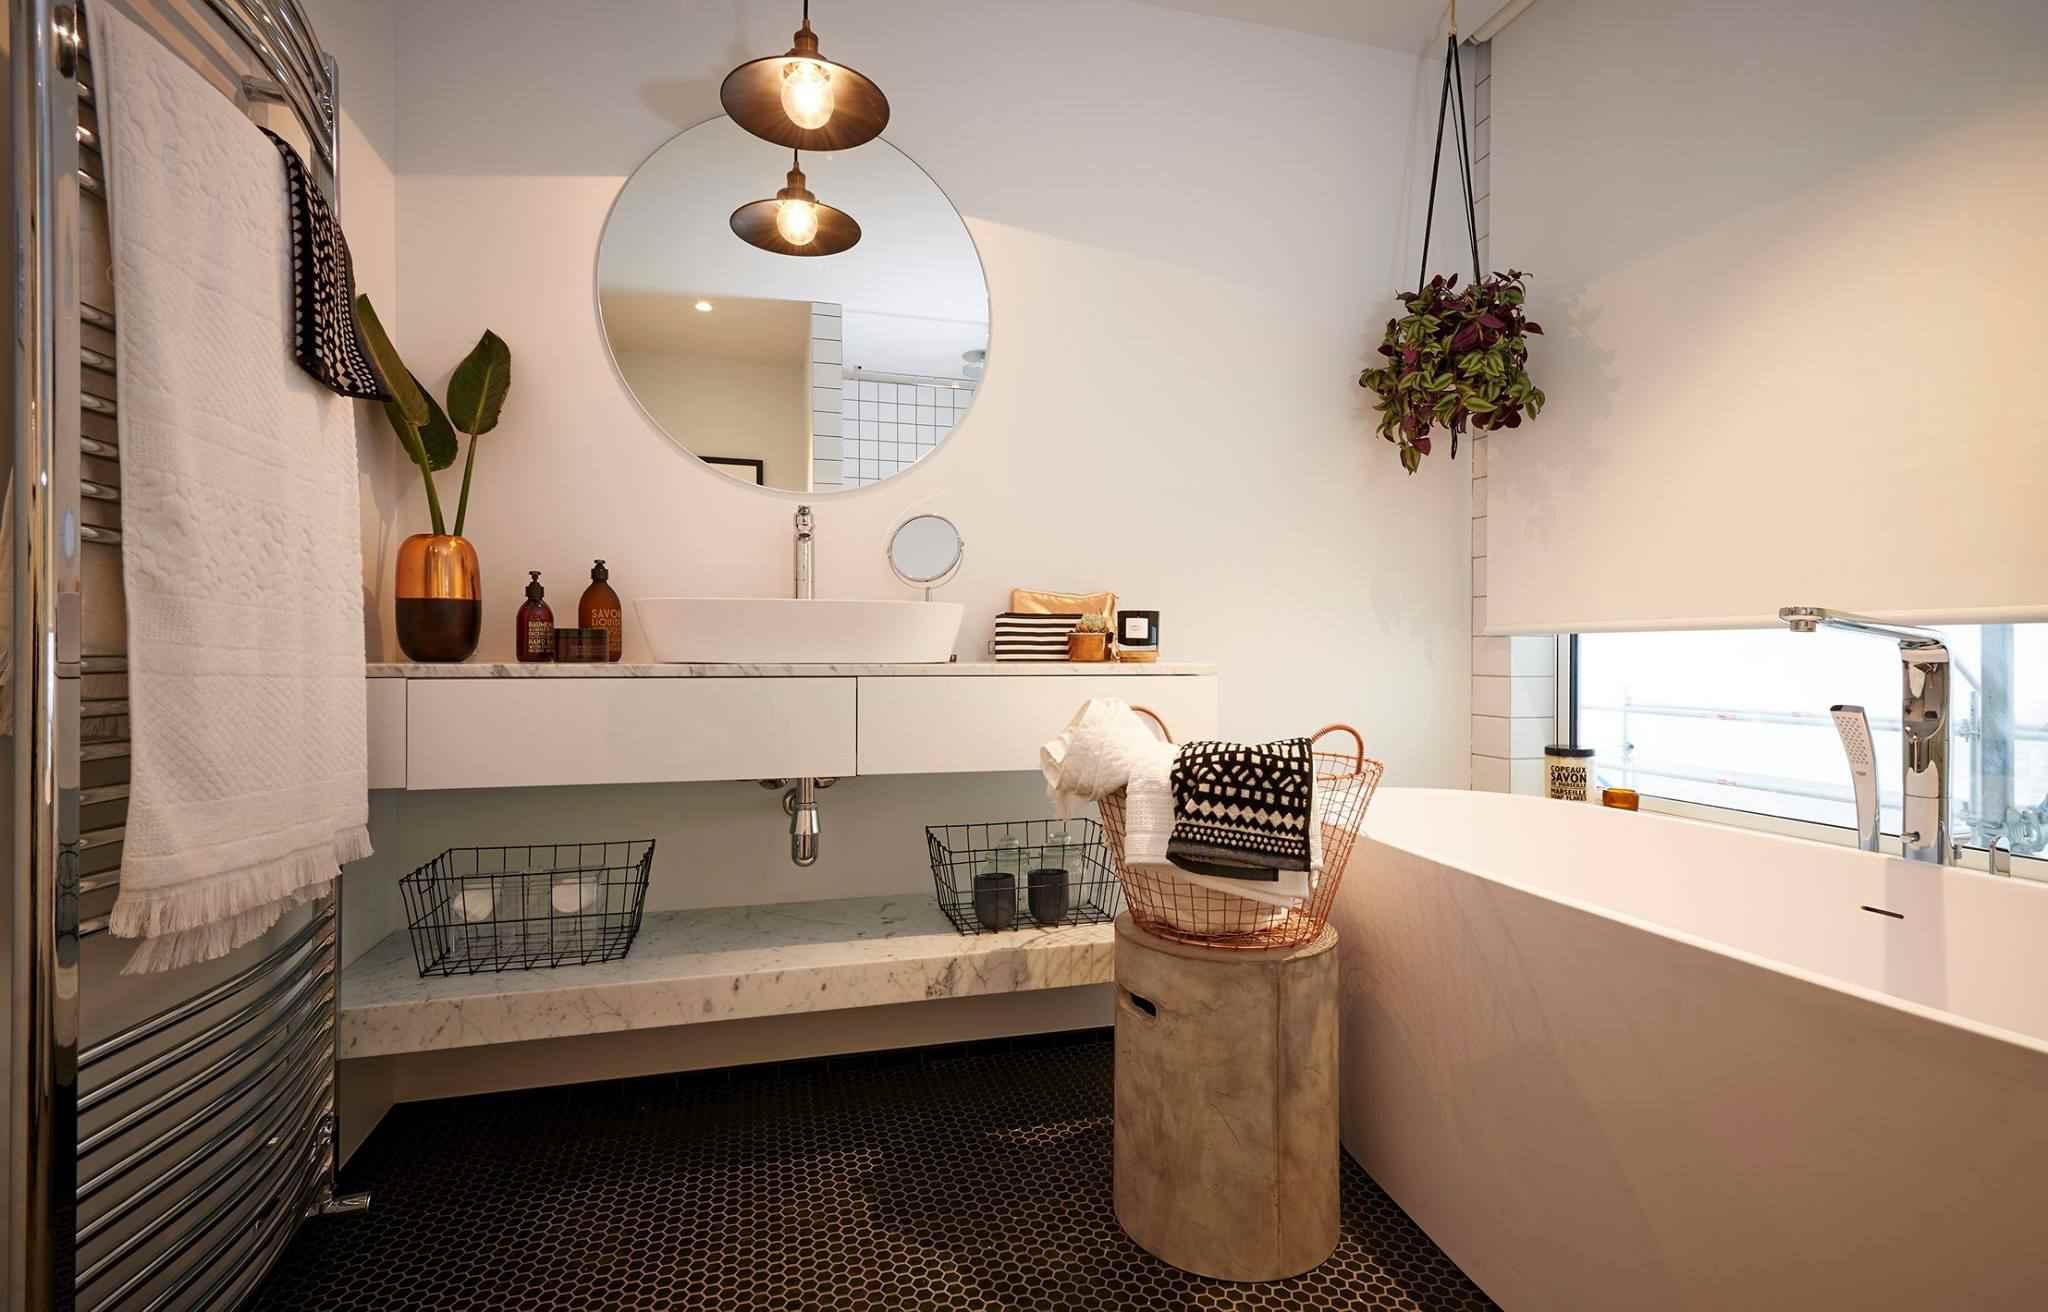 Bathroom with metal baskets